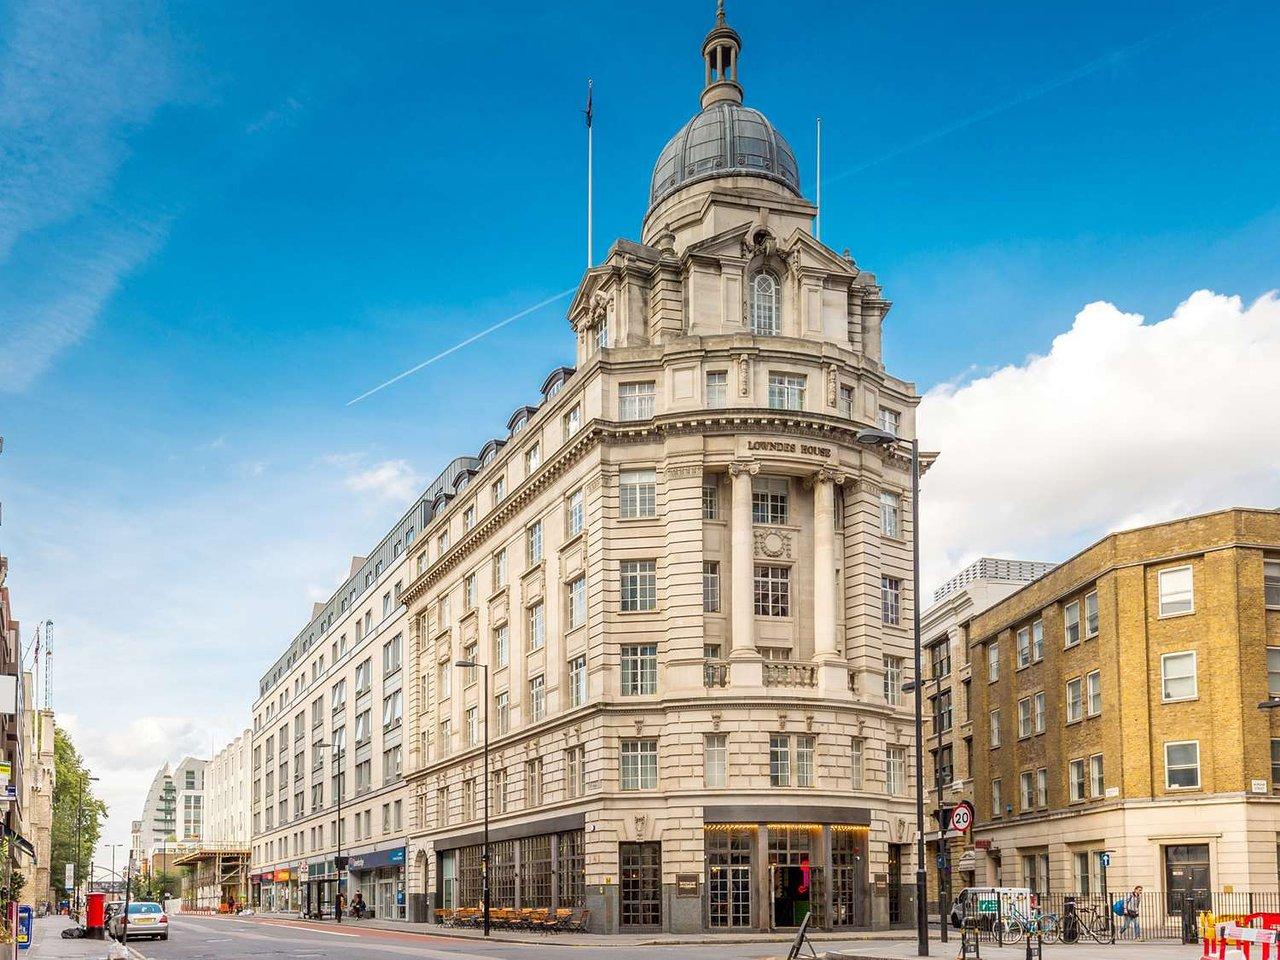 Travelodge London Central City Road Hotel Reviews Photos Price Comparison Tripadvisor